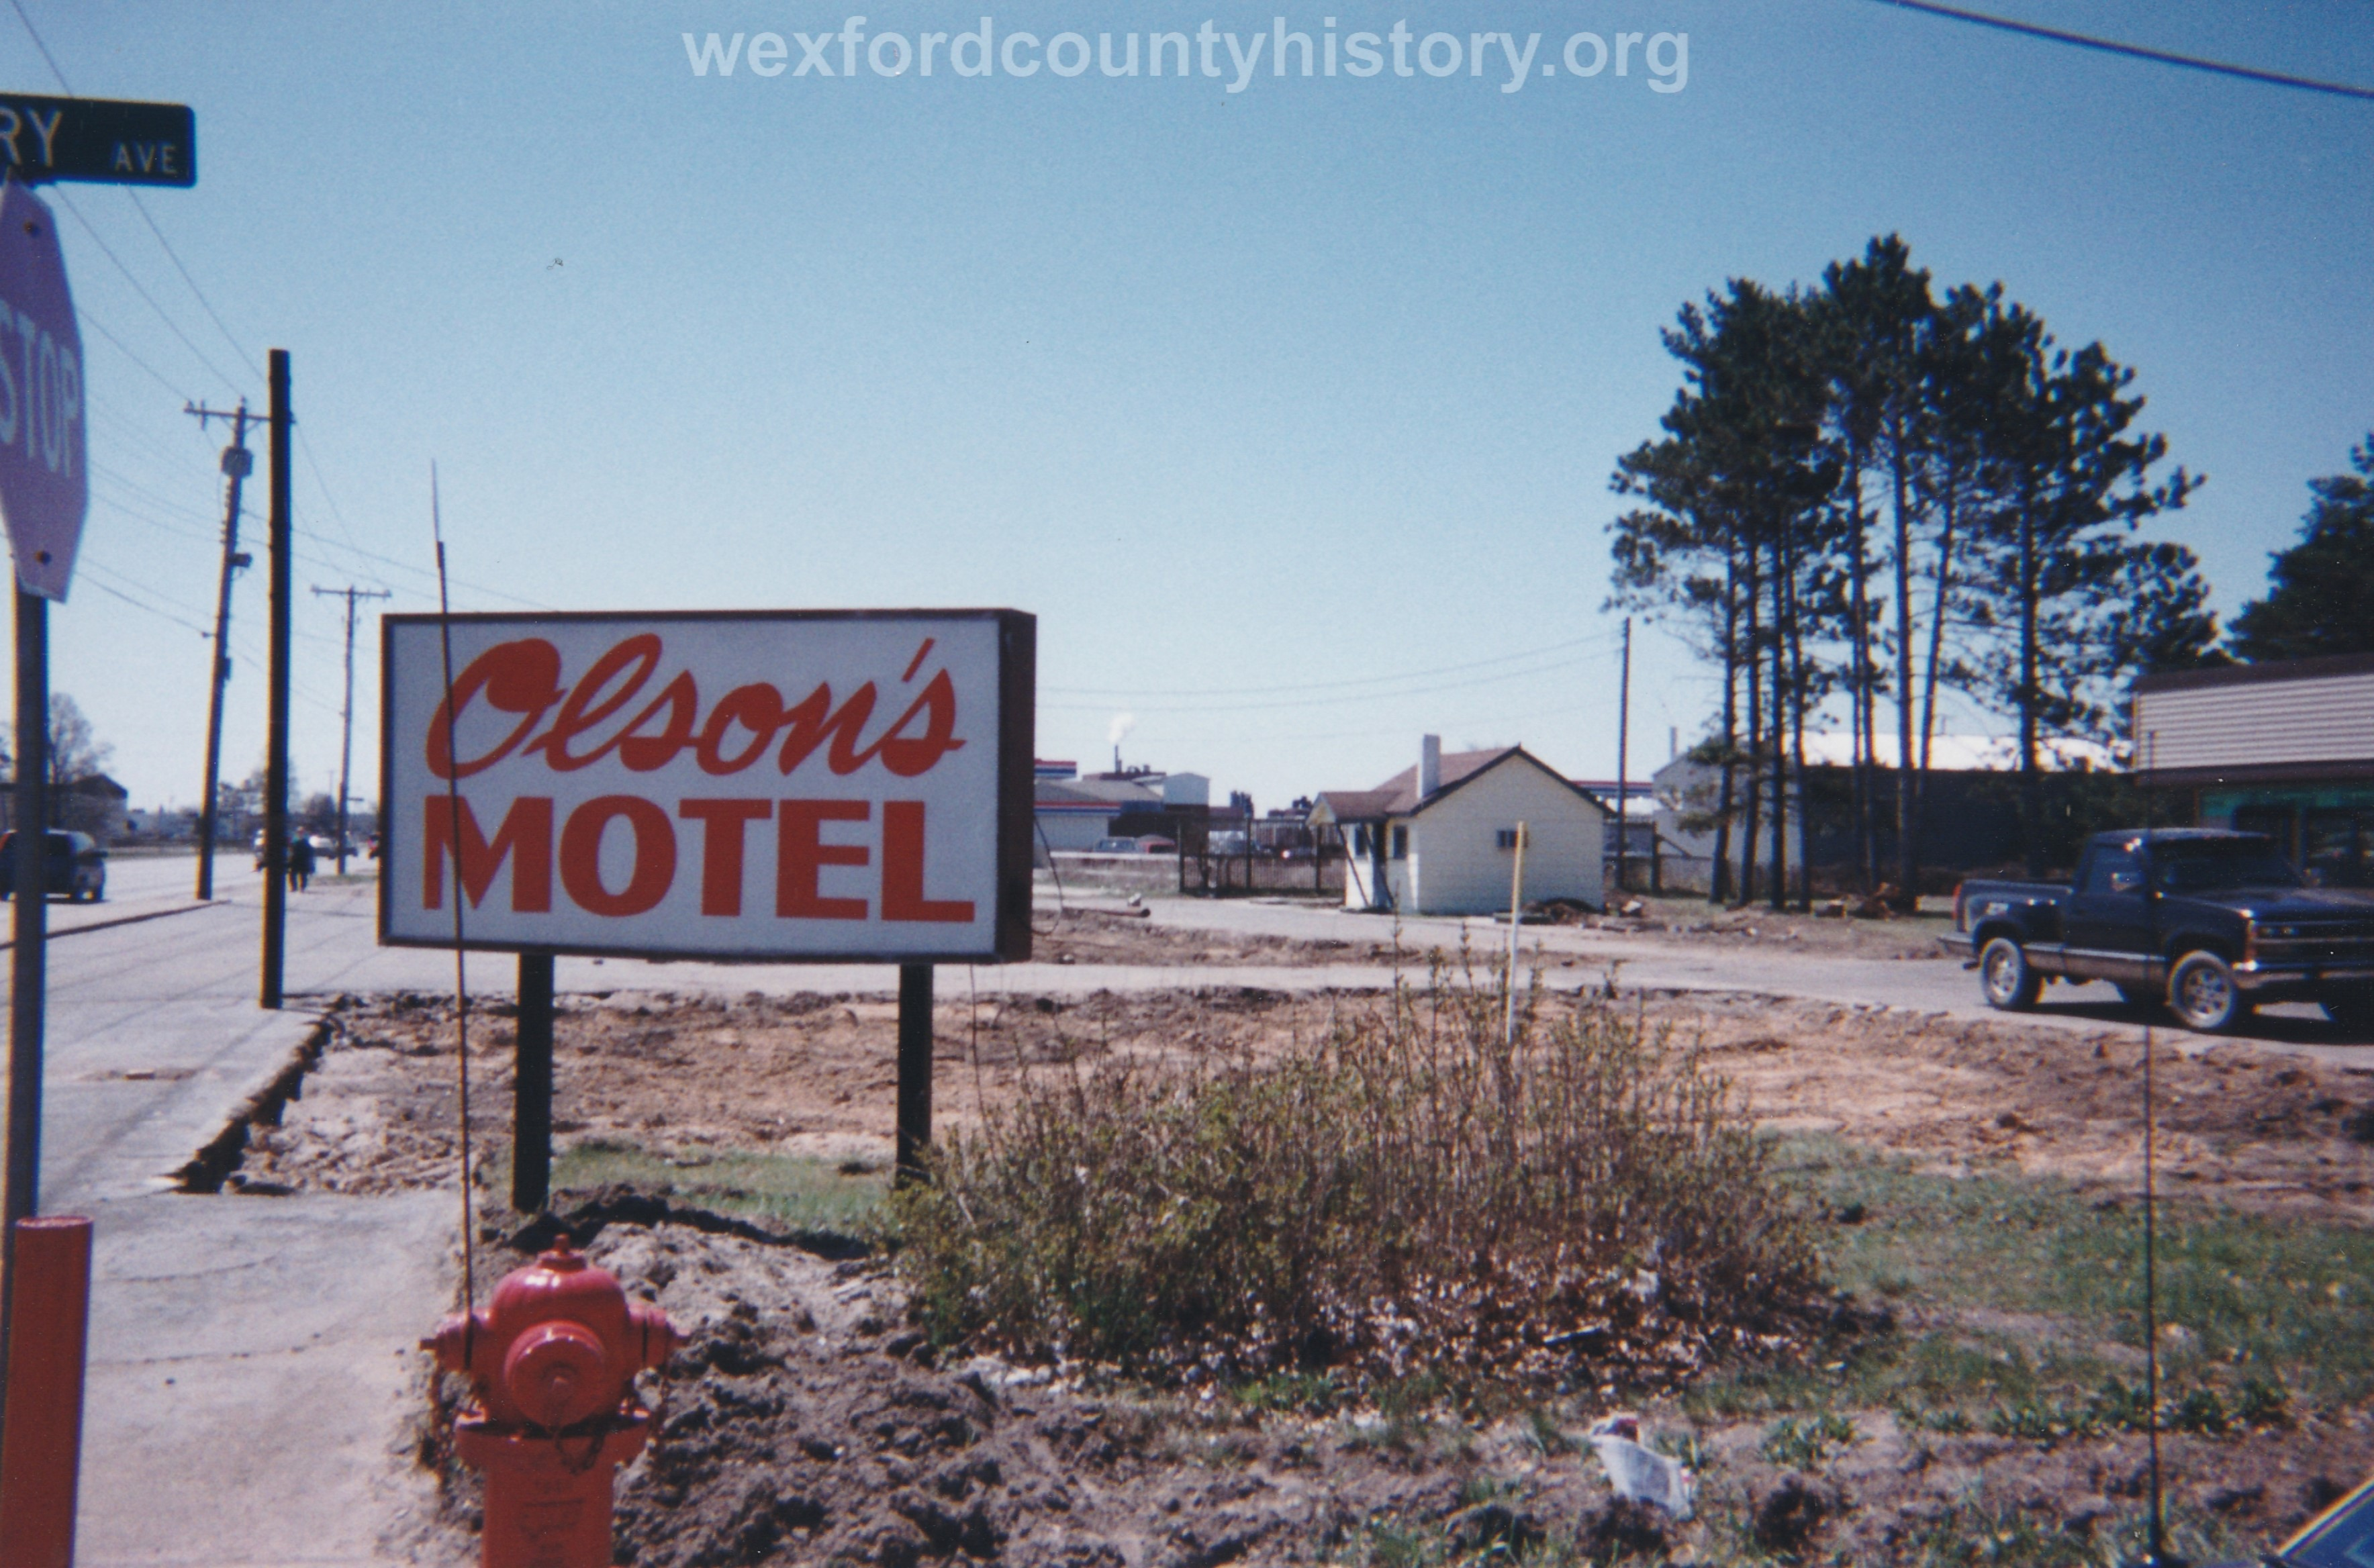 Olson's Motel